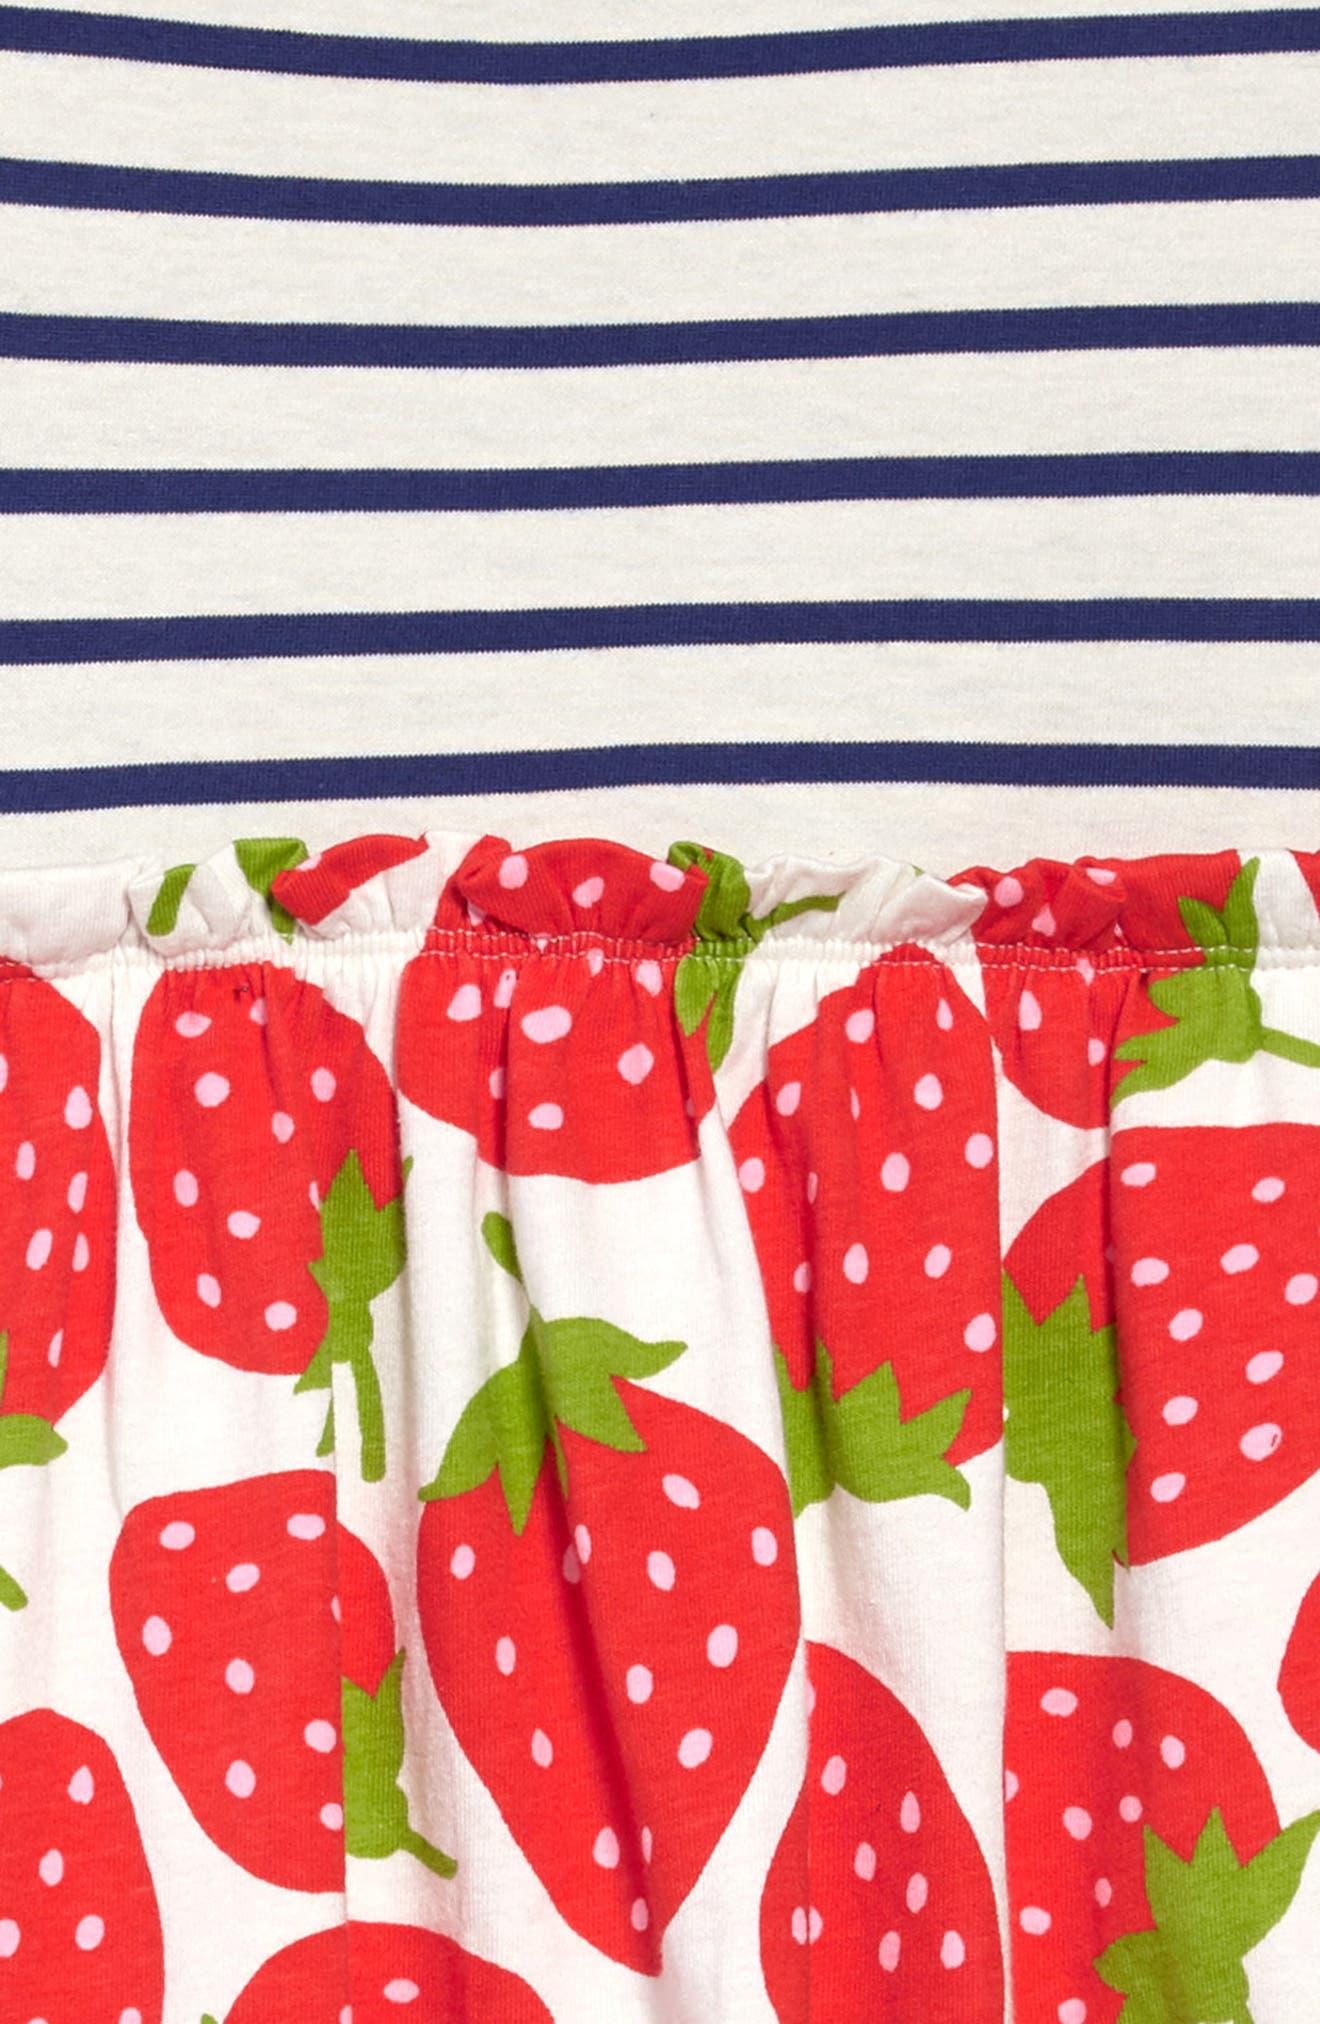 Stripe & Strawberries Print Dress,                             Alternate thumbnail 3, color,                             909